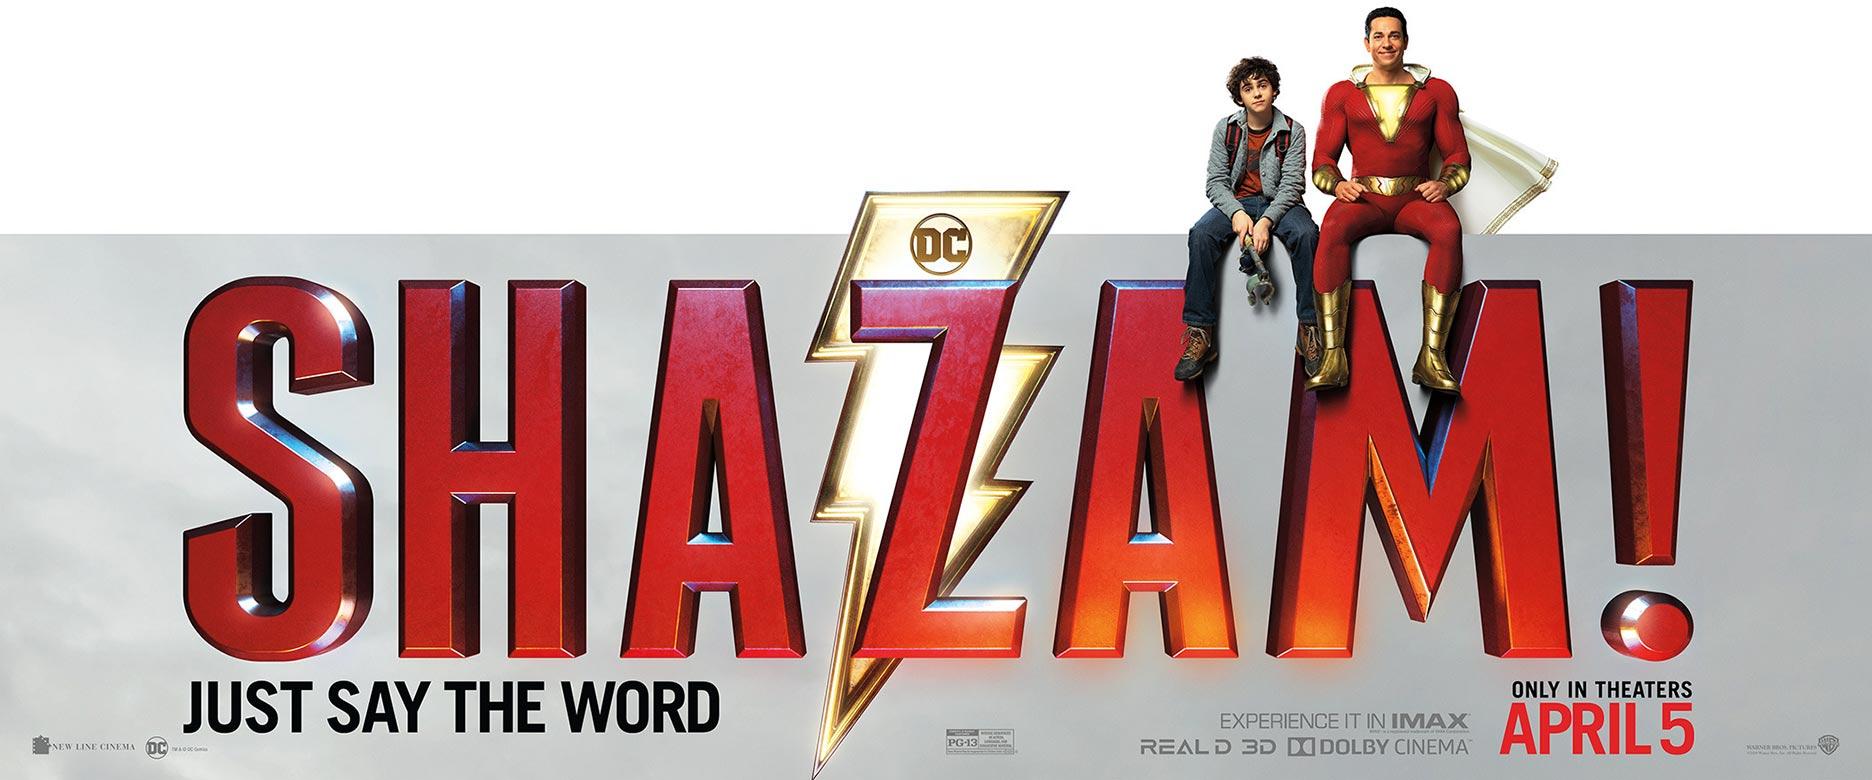 Shazam! Poster #5